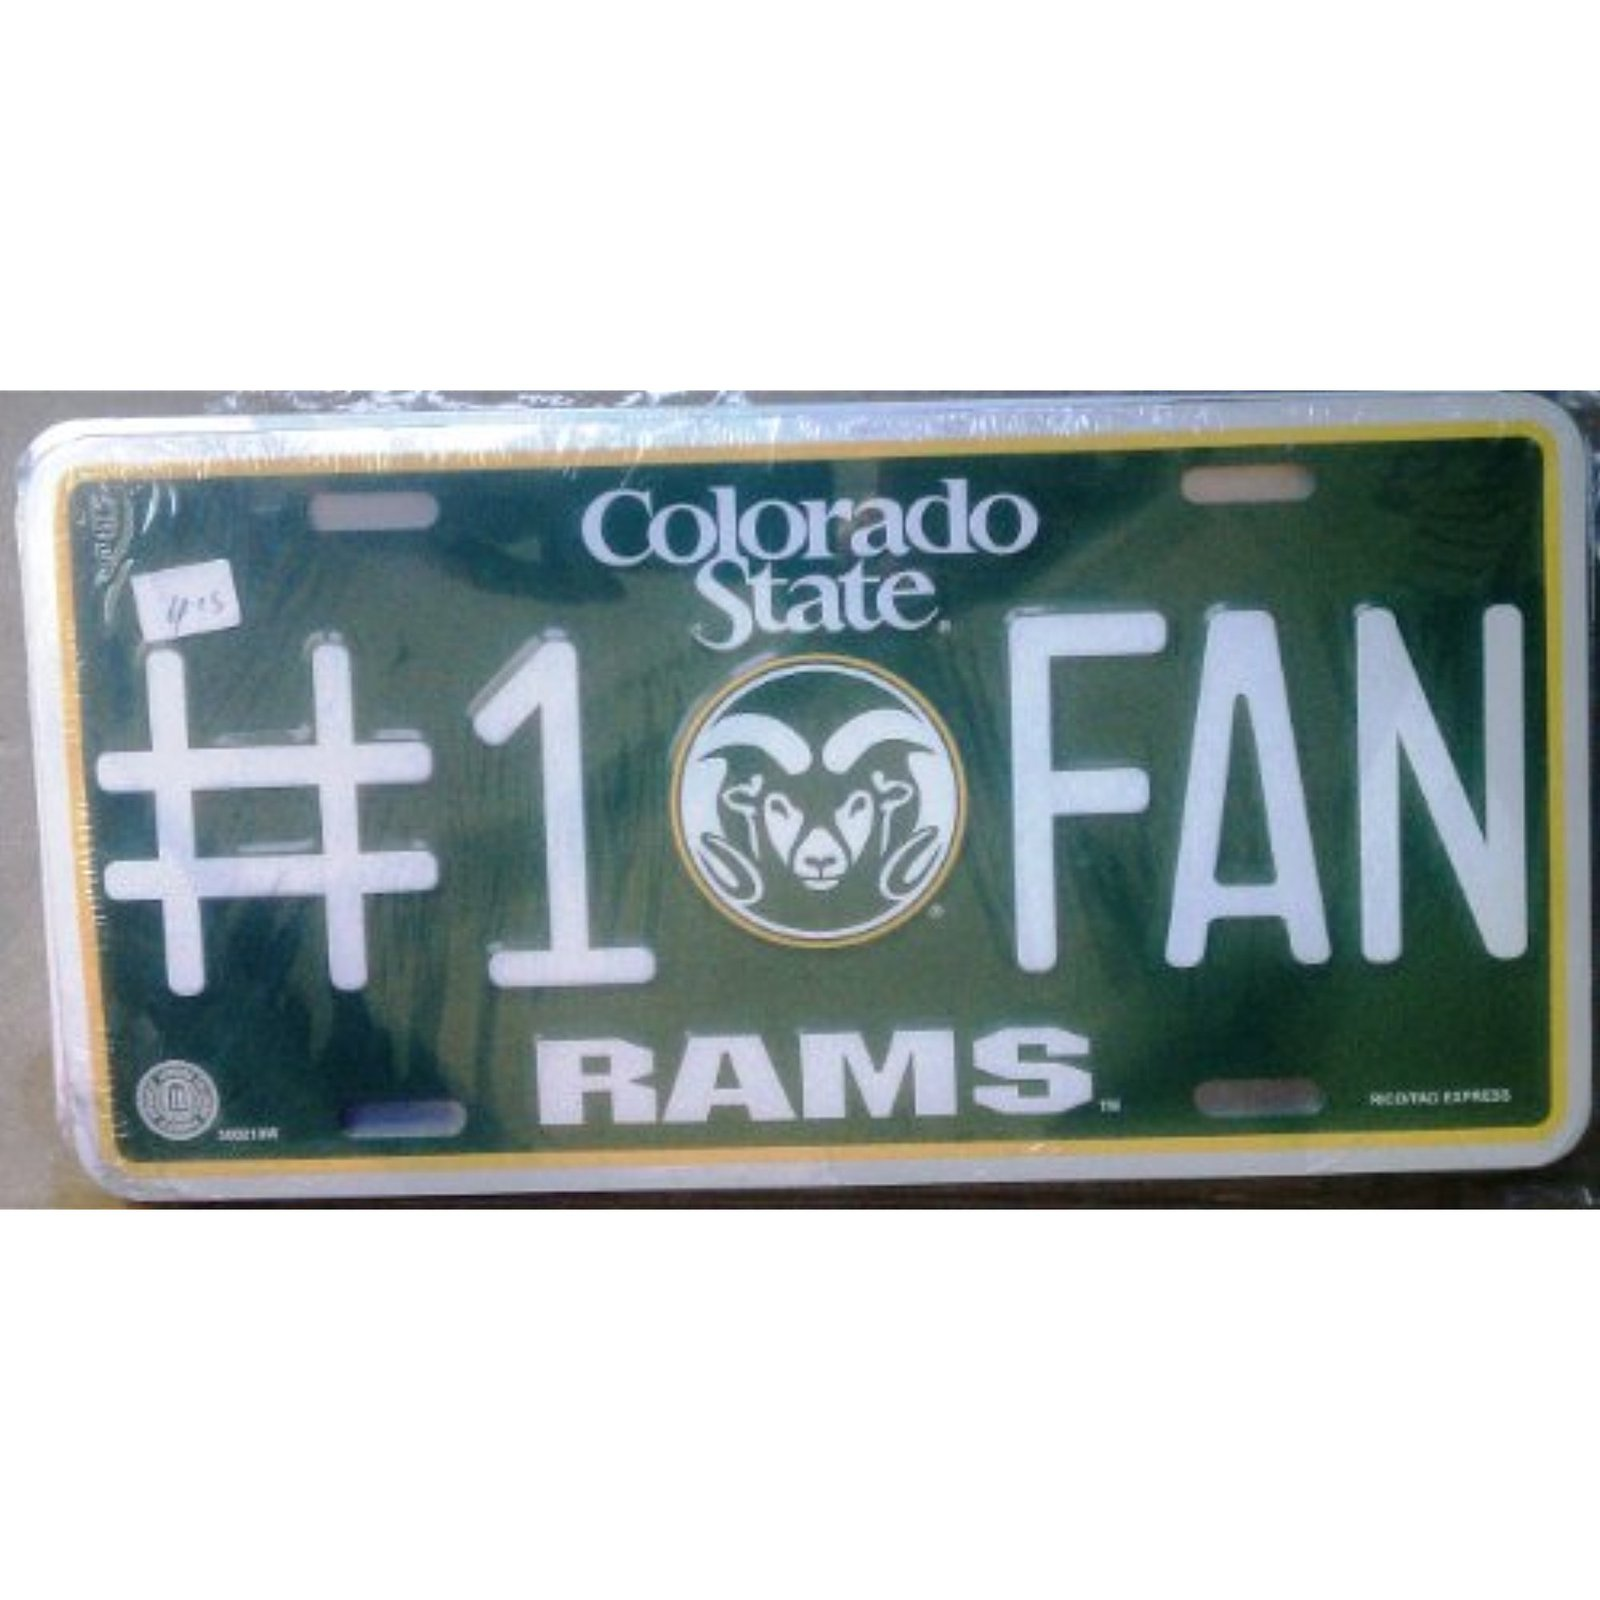 NCAA Colorado State Rams #1 Fan Metal Tag License Plate